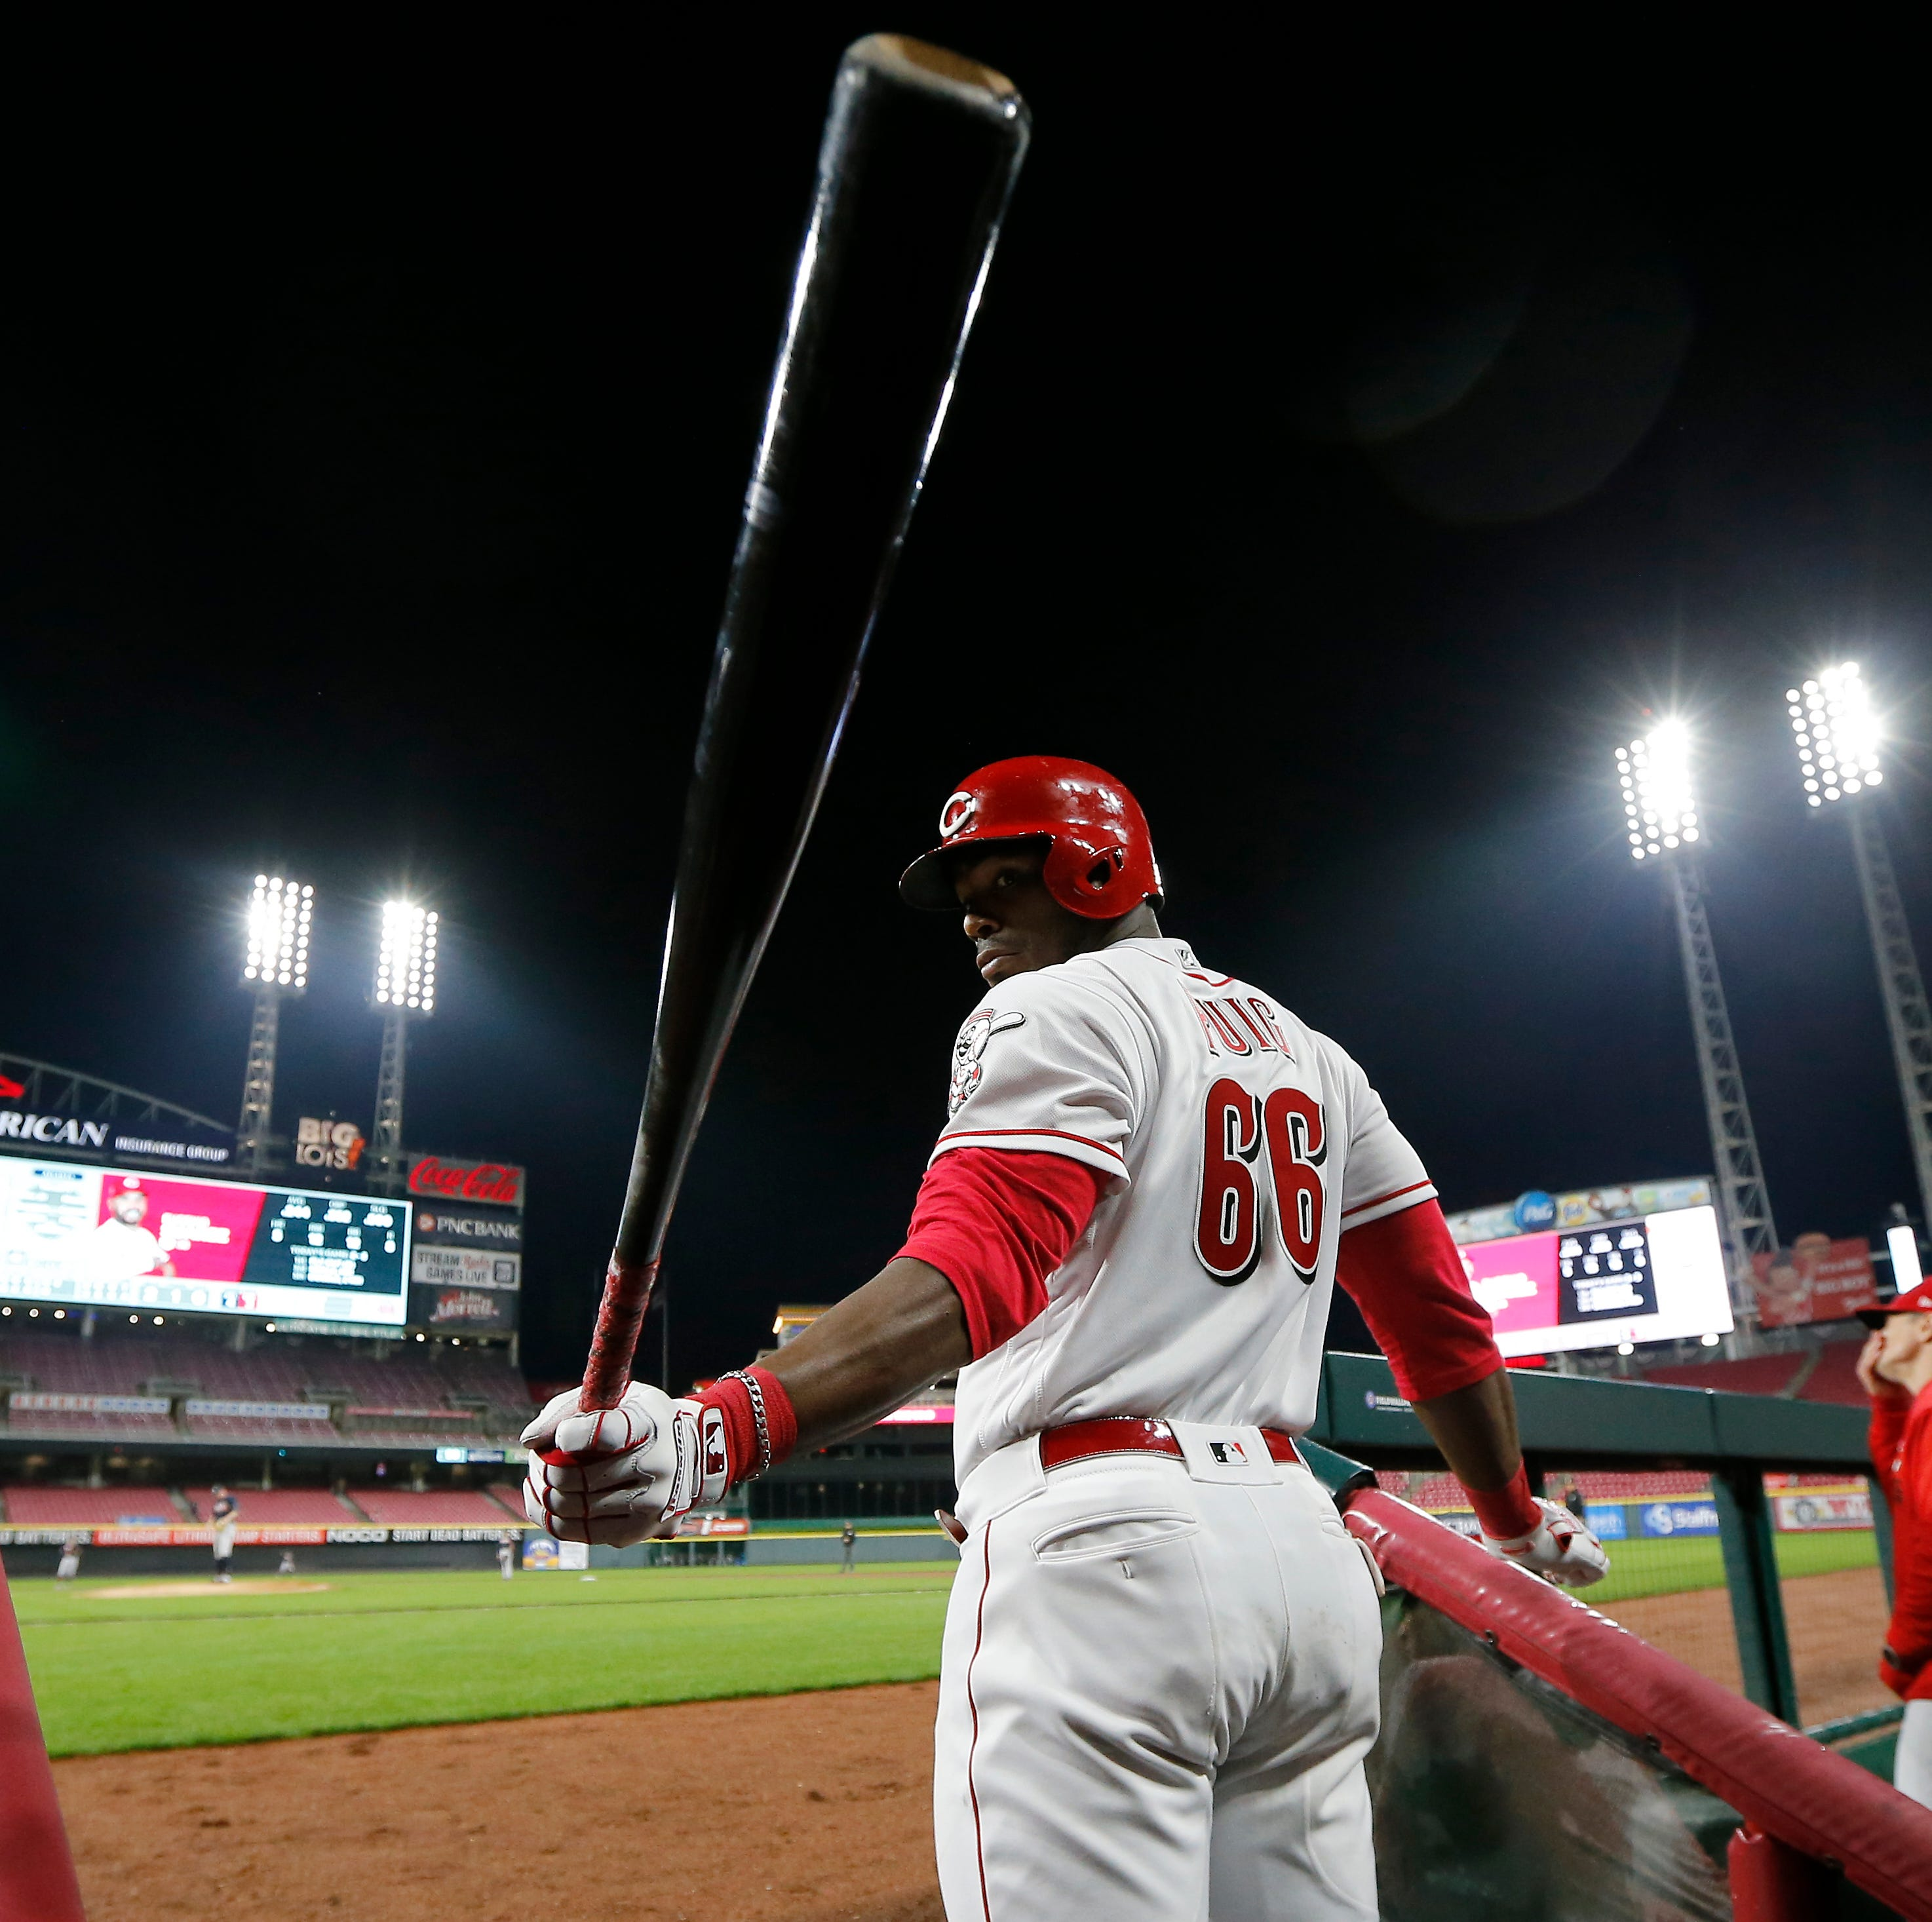 MLB Network's Eric Byrnes predicts May breakout for Cincinnati Reds' Yasiel Puig